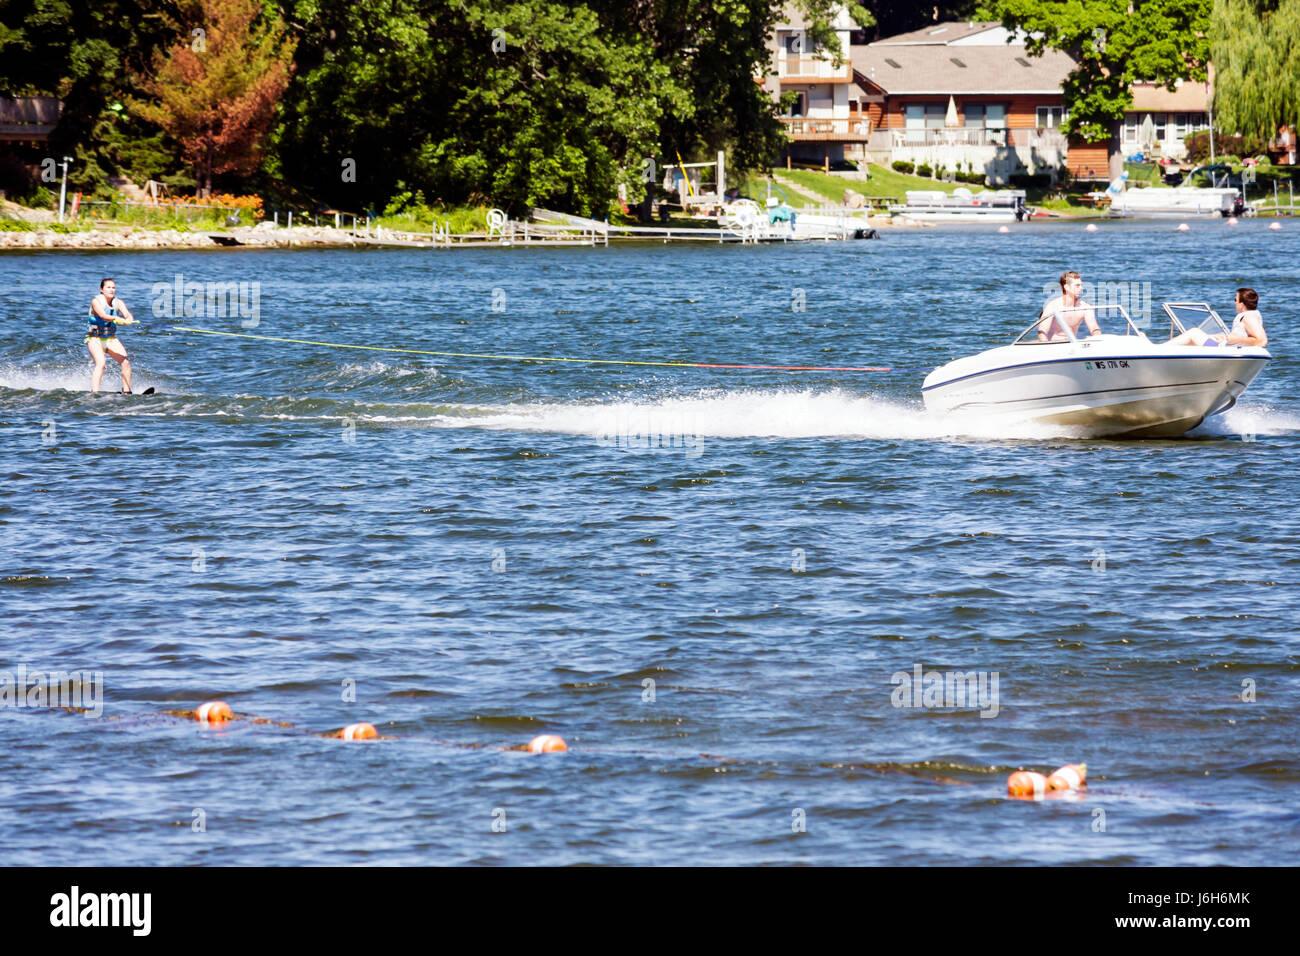 Wisconsin Kenosha Paddock Lake Old Settlers Park motor boat water skiing skier spotter sport recreation speed - Stock Image